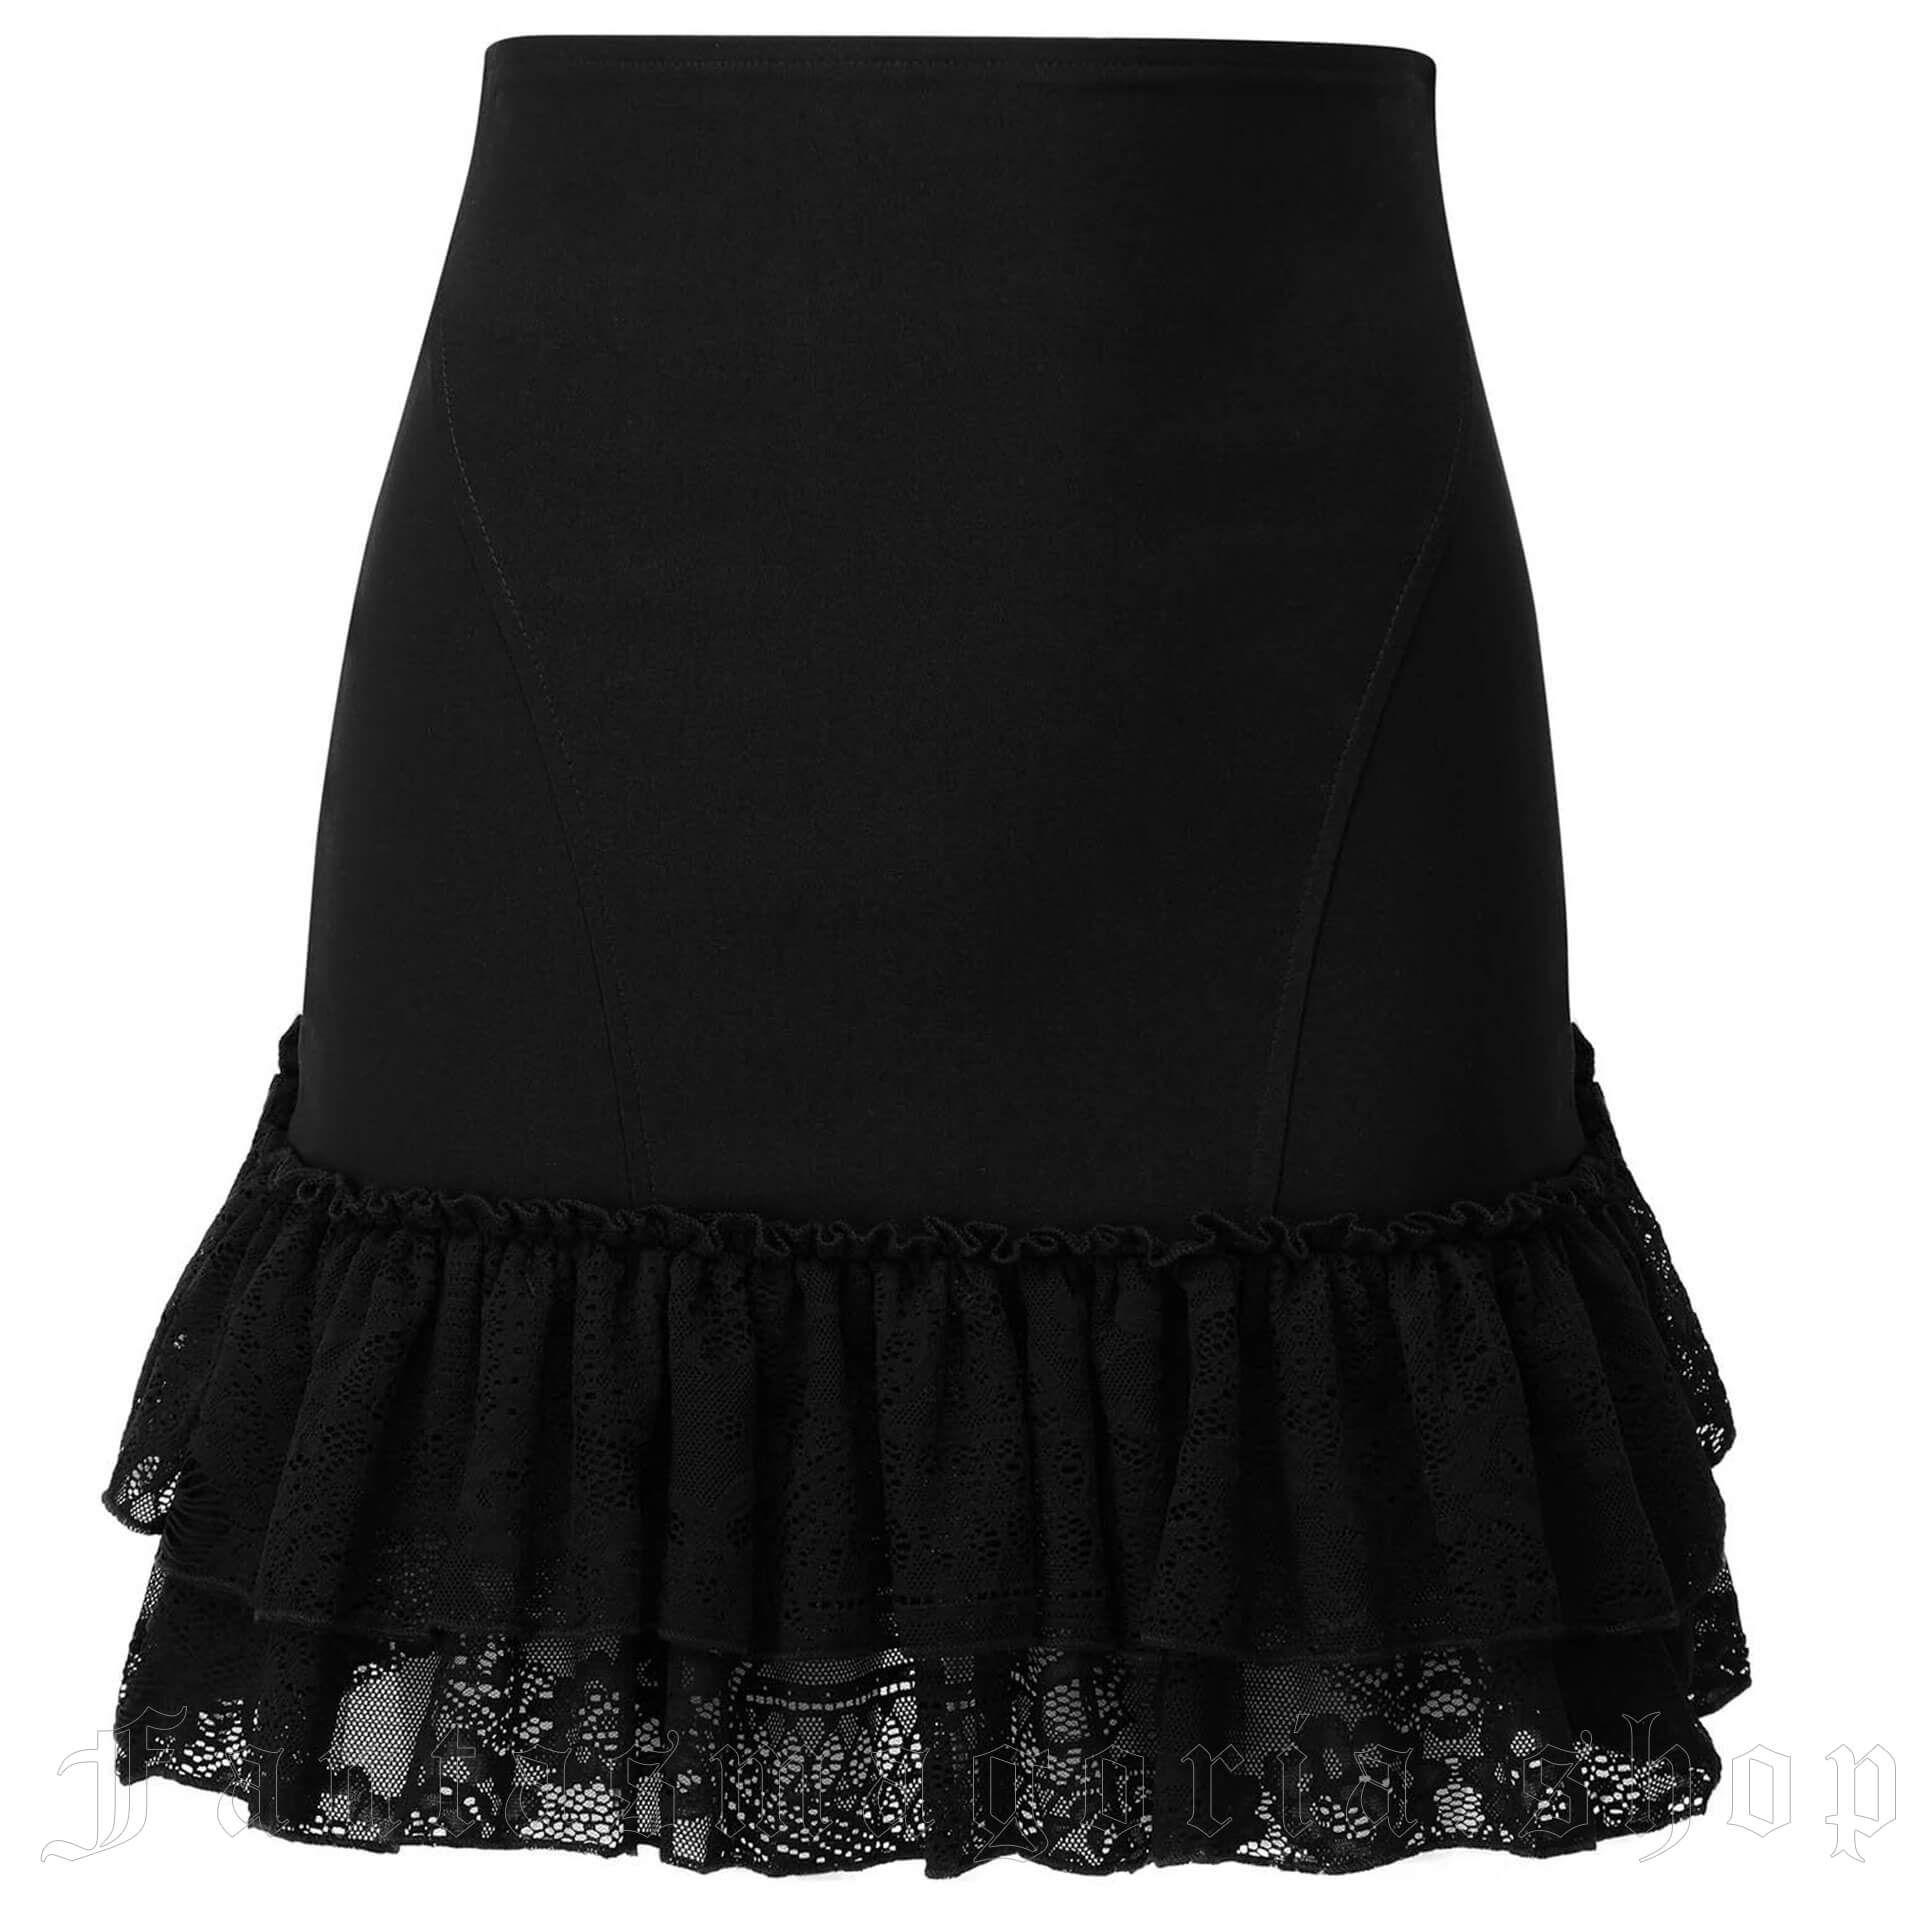 Adoria Bustle Skirt